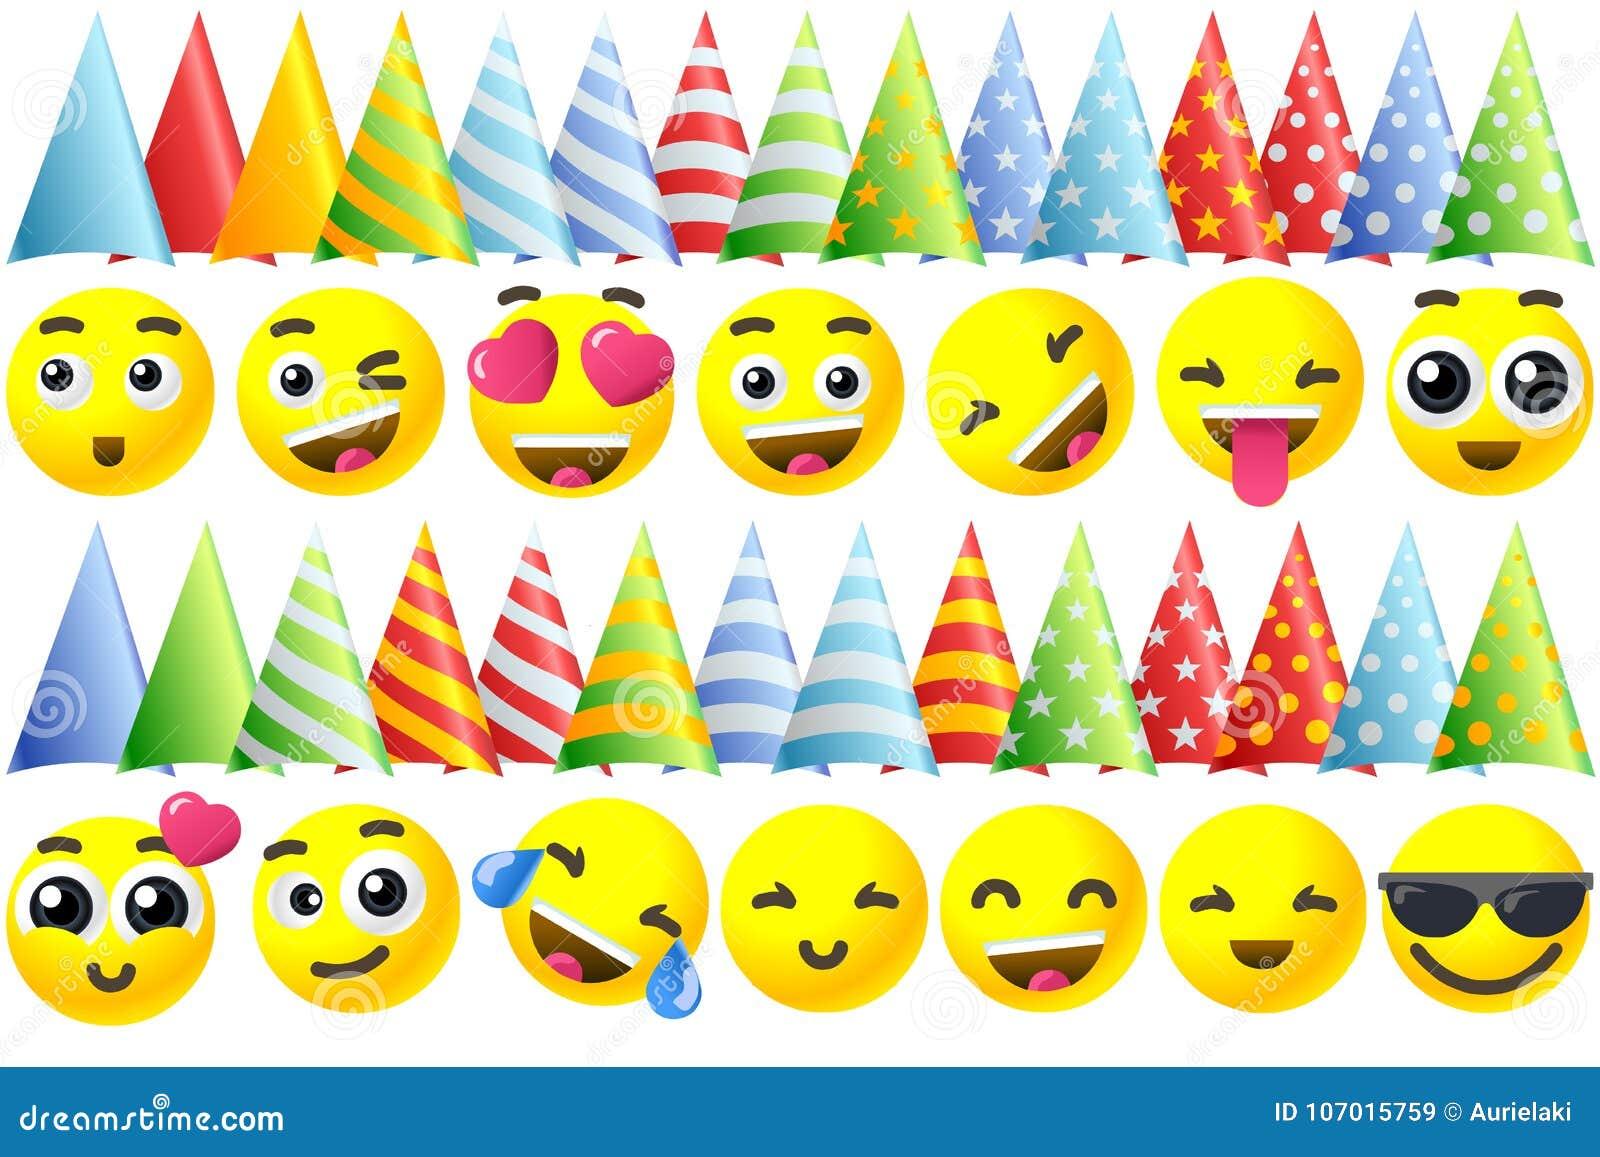 Alles Gute Zum Geburtstag Emoji Ikonen Vektor Abbildung